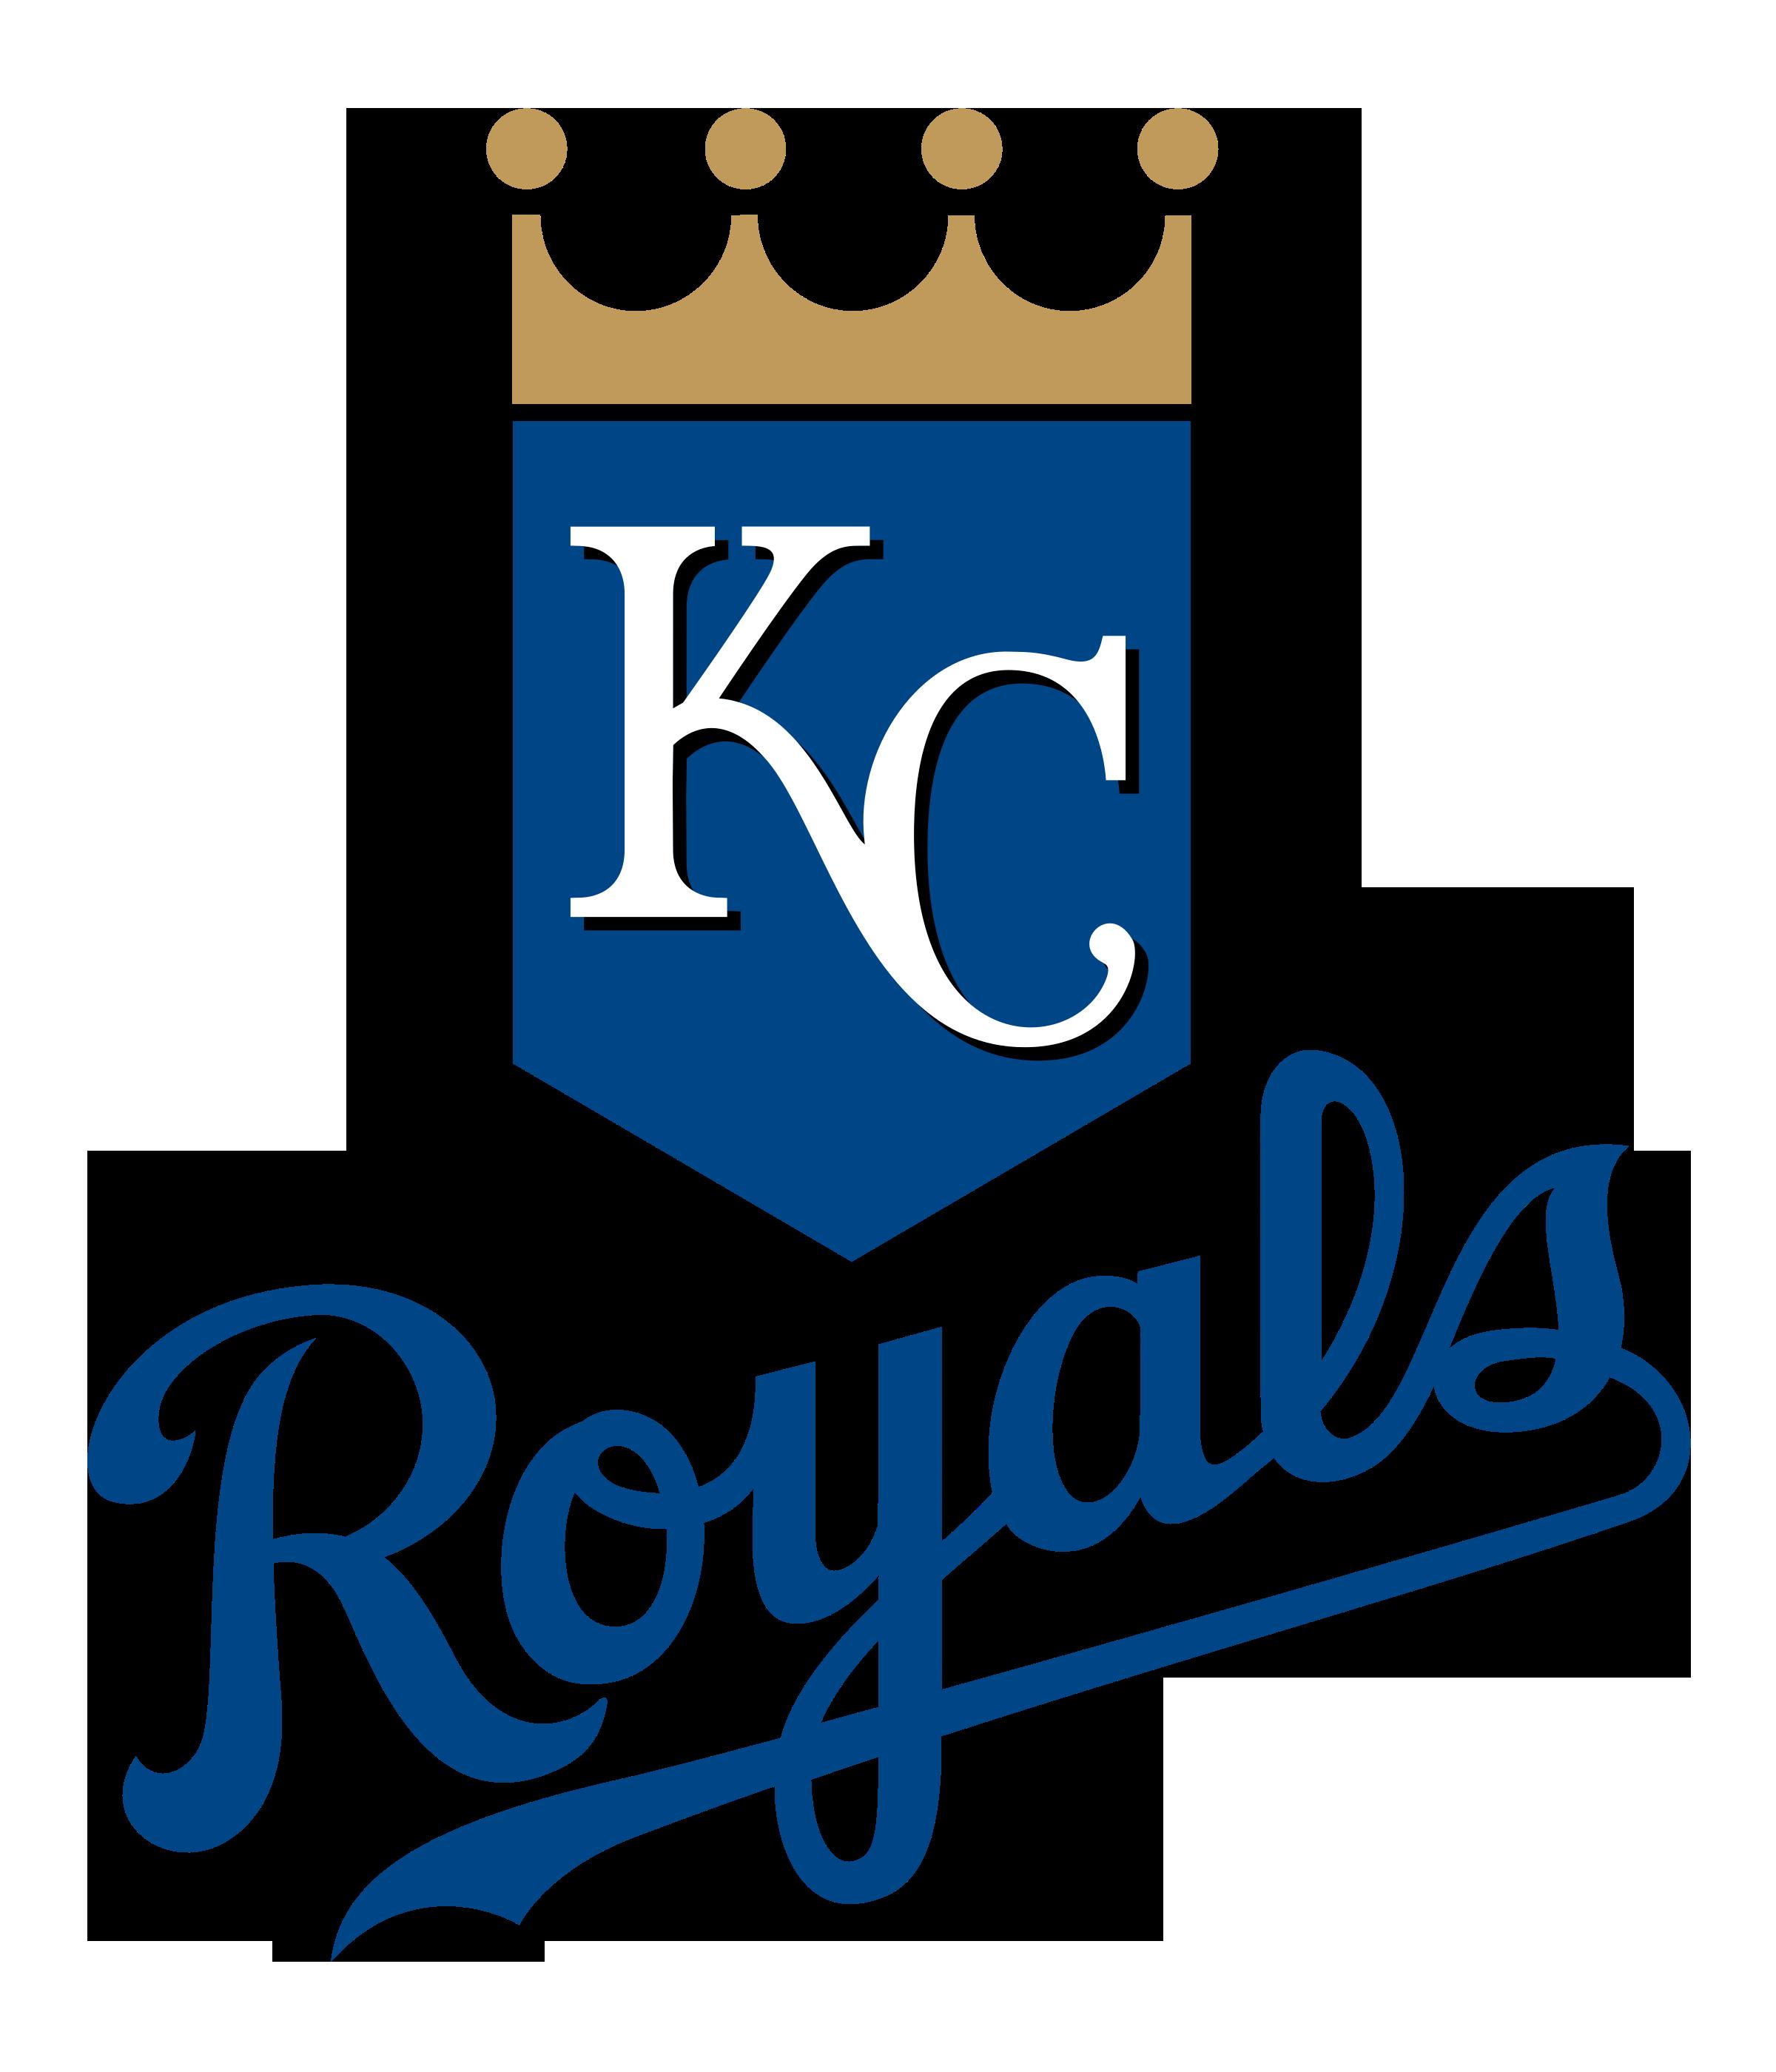 Kansas City Royals Logo PNG Image.